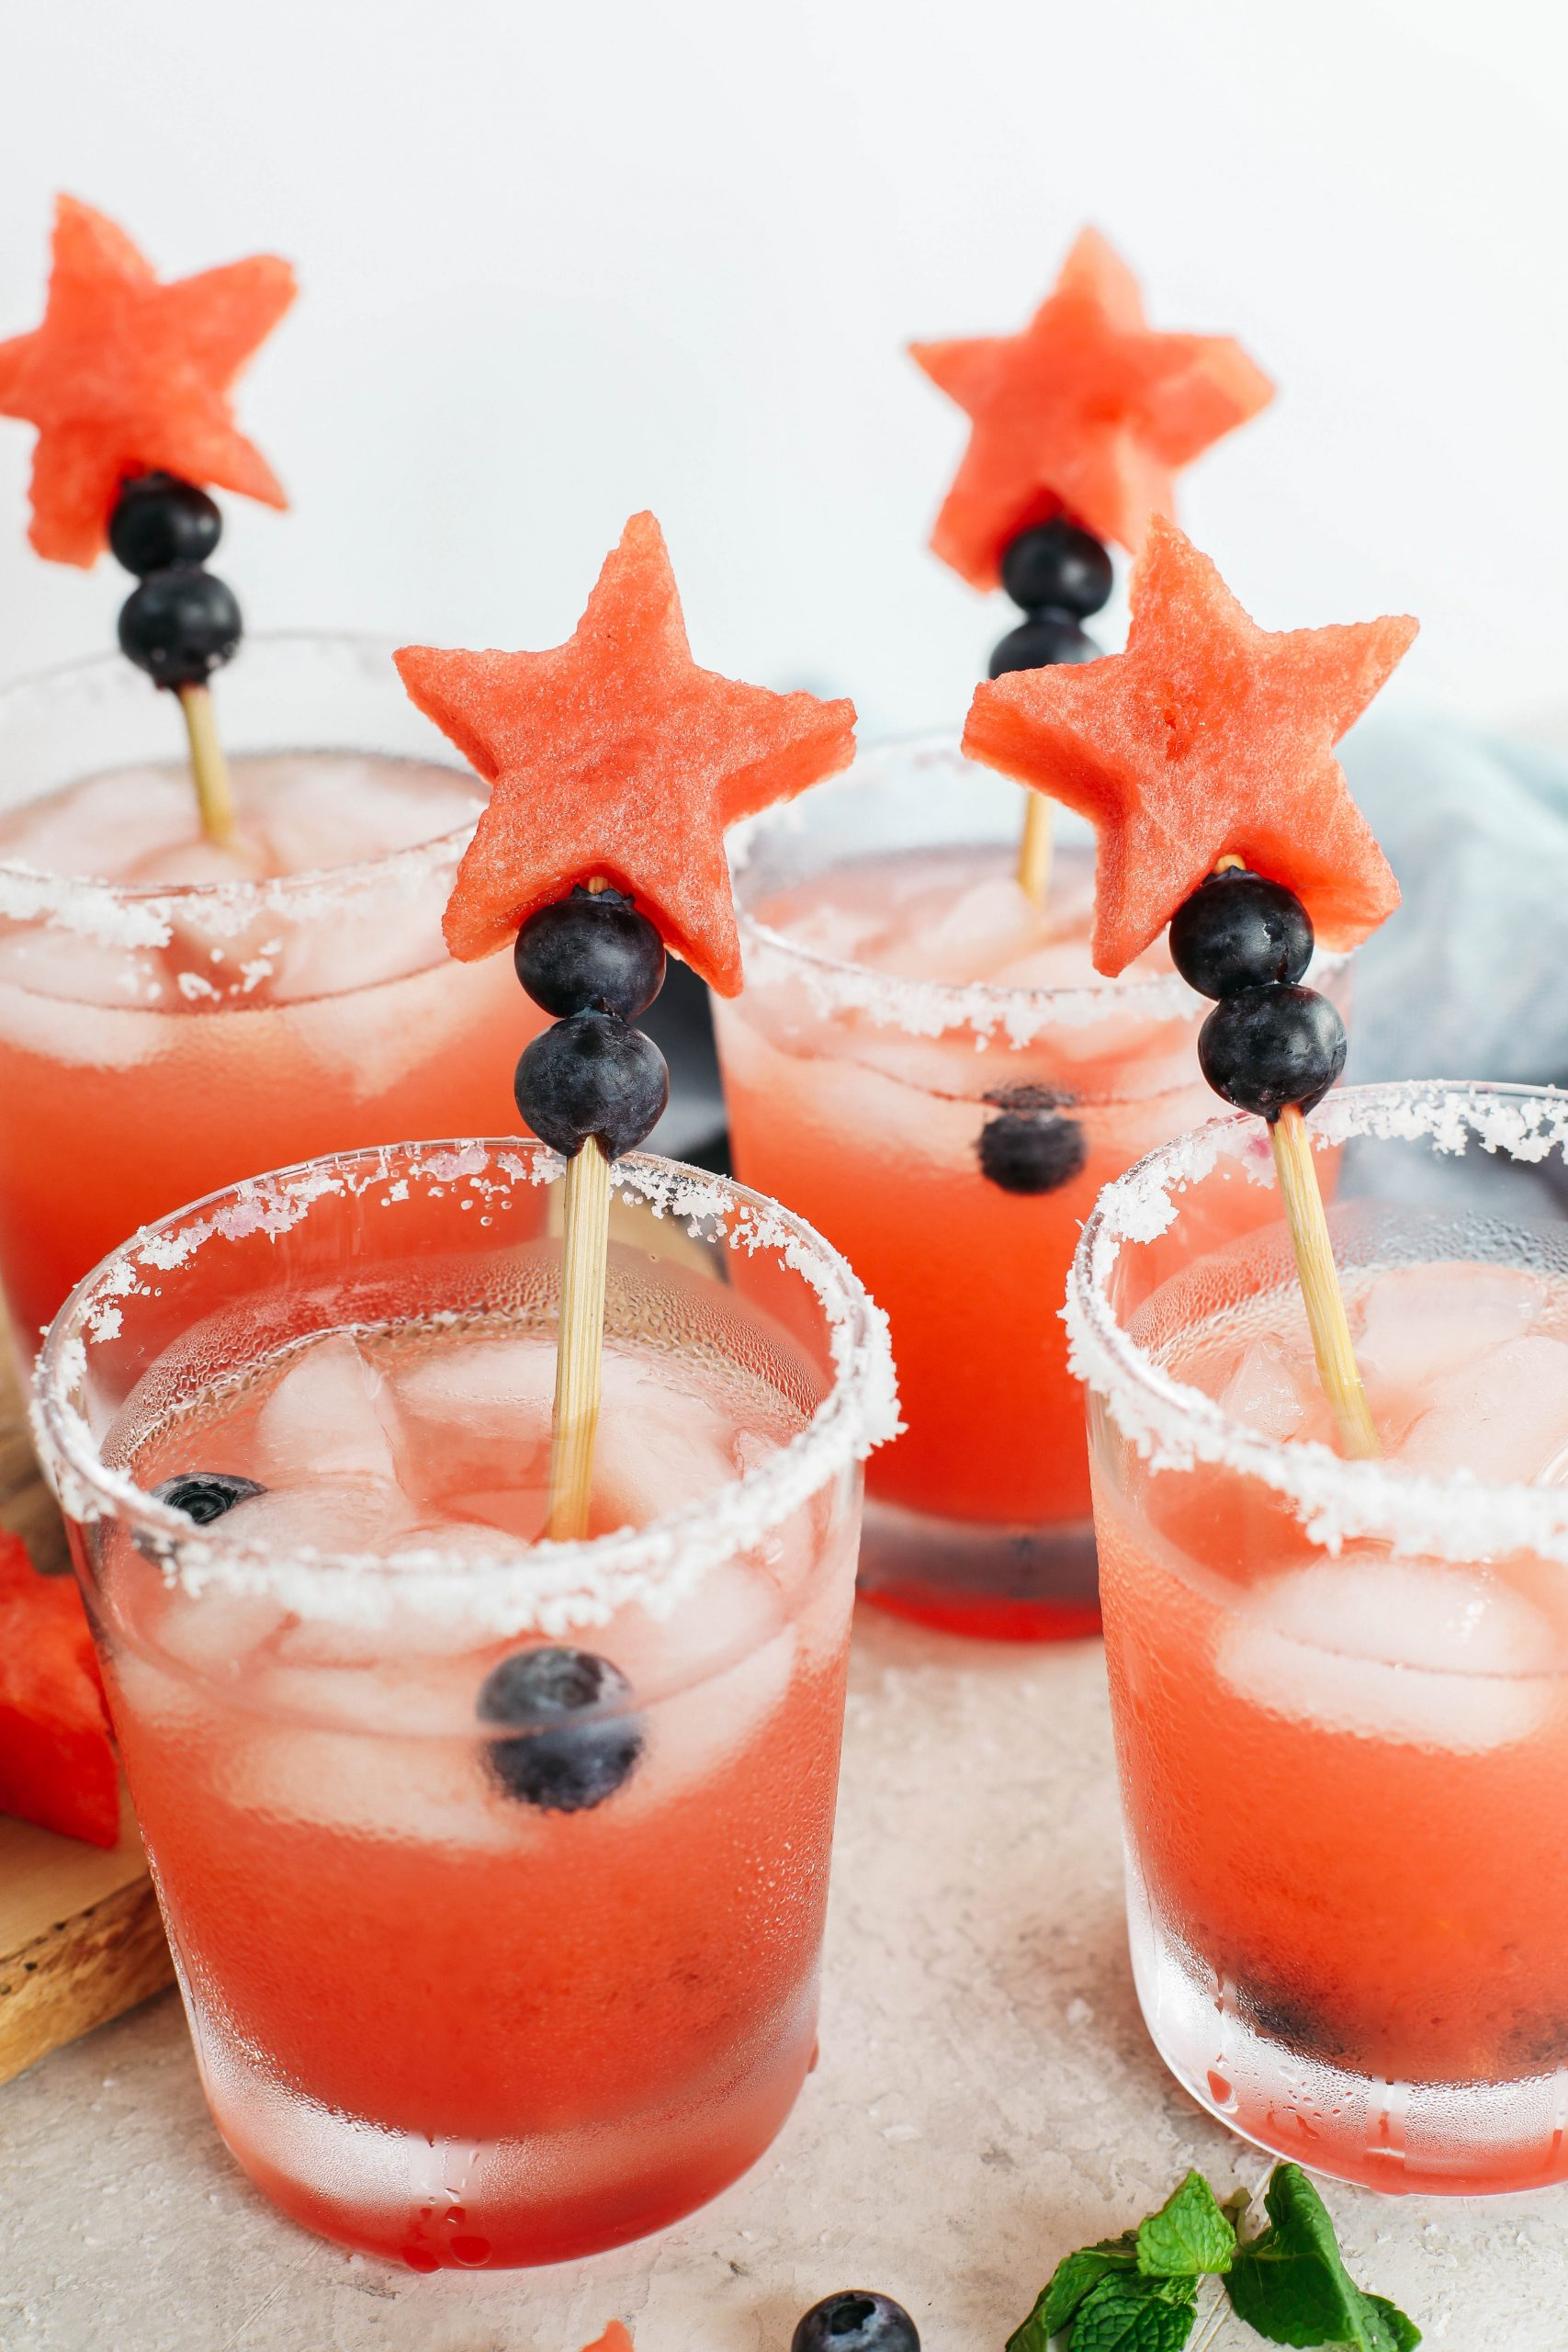 Margaritas de melancia fresca - coma você mesmo magro 33